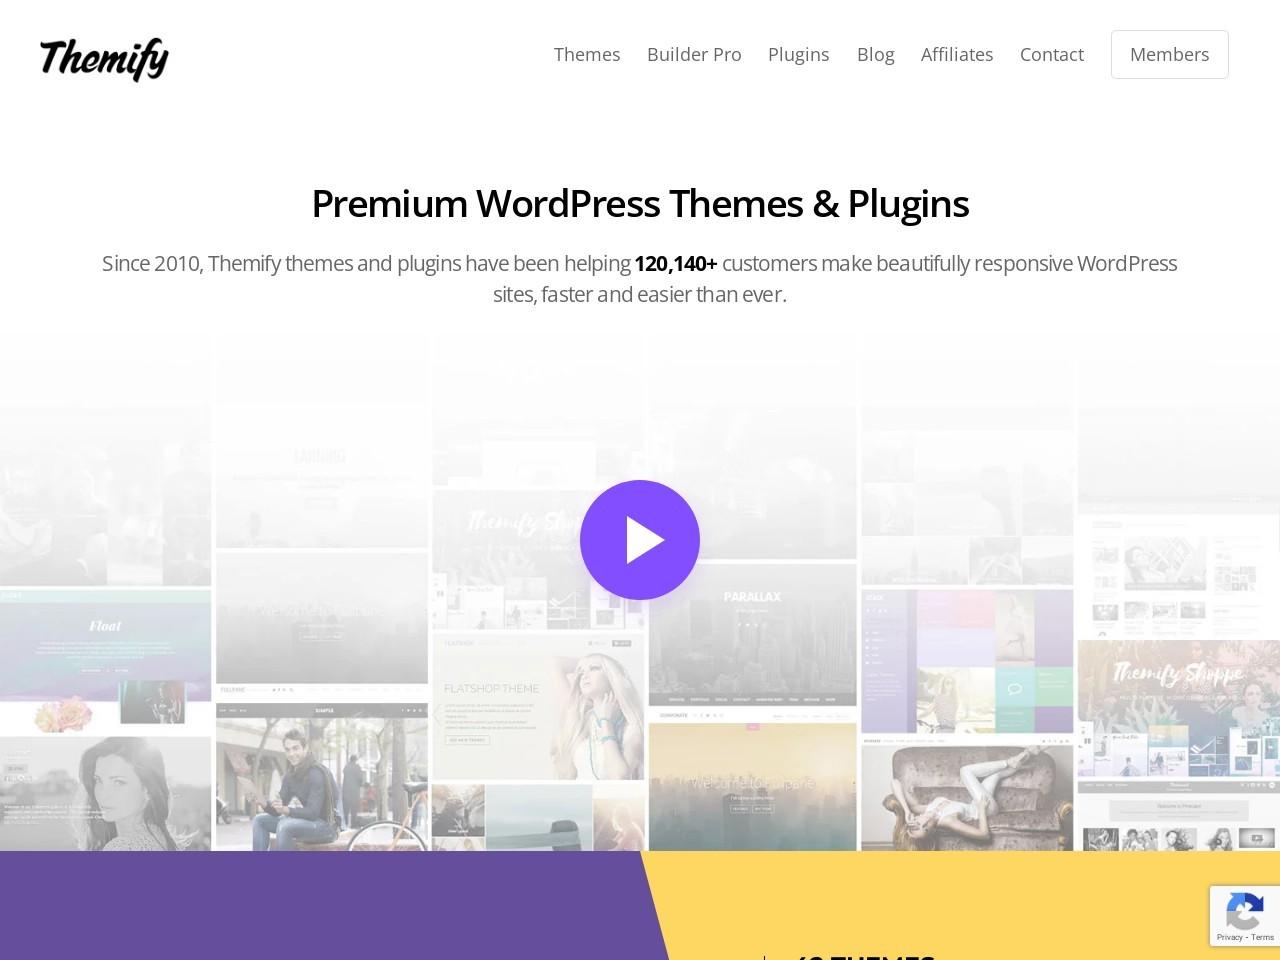 http://themify.me/demo/themes/blogfolio